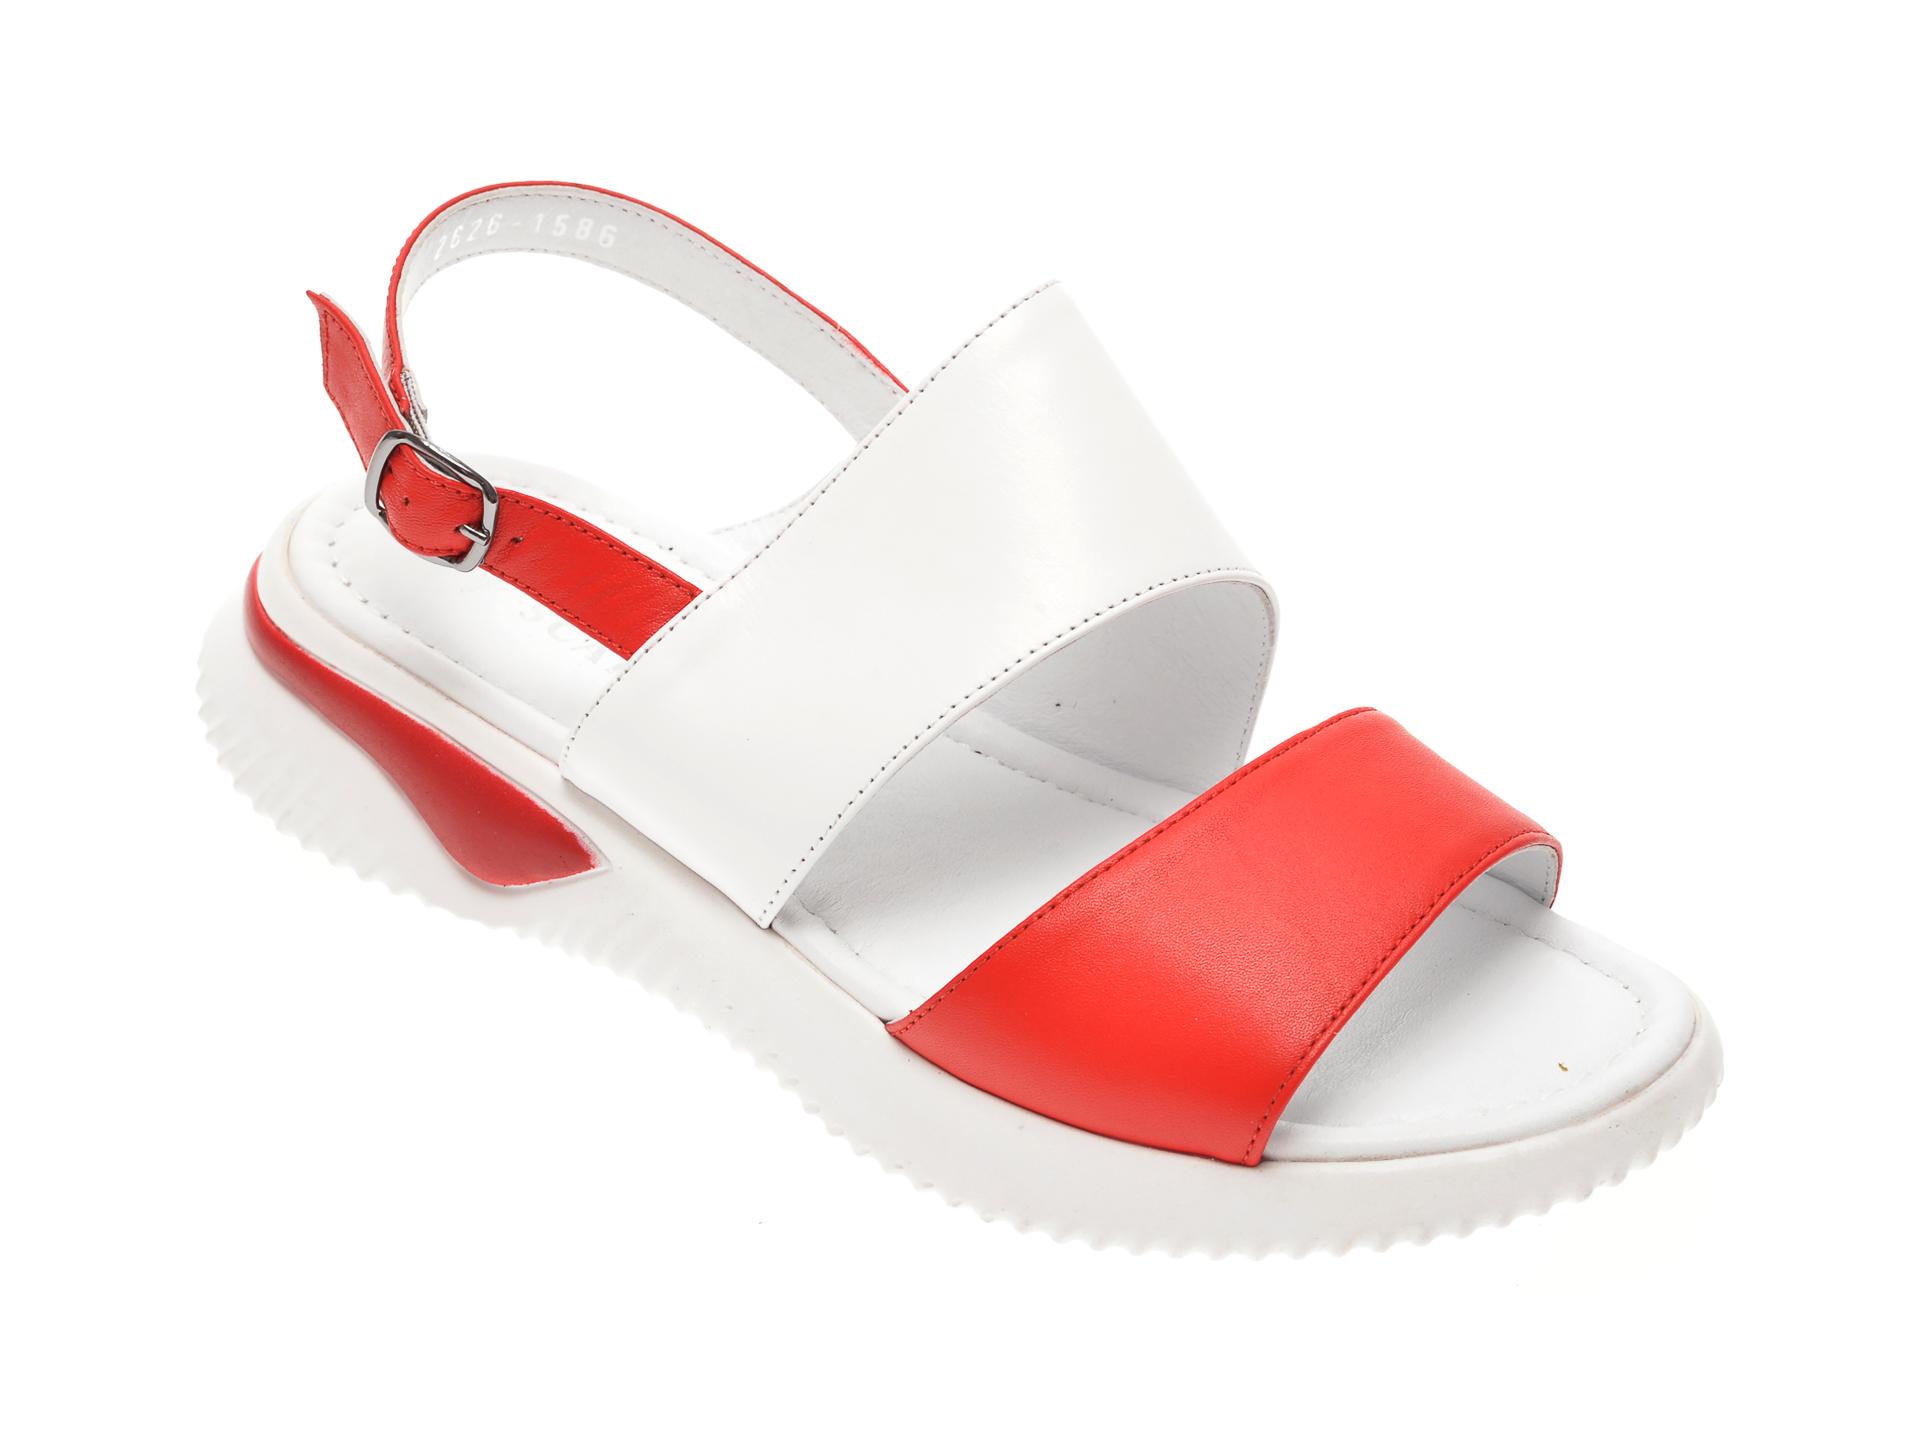 Sandale MISS LIZA rosii, 1182626, din piele naturala